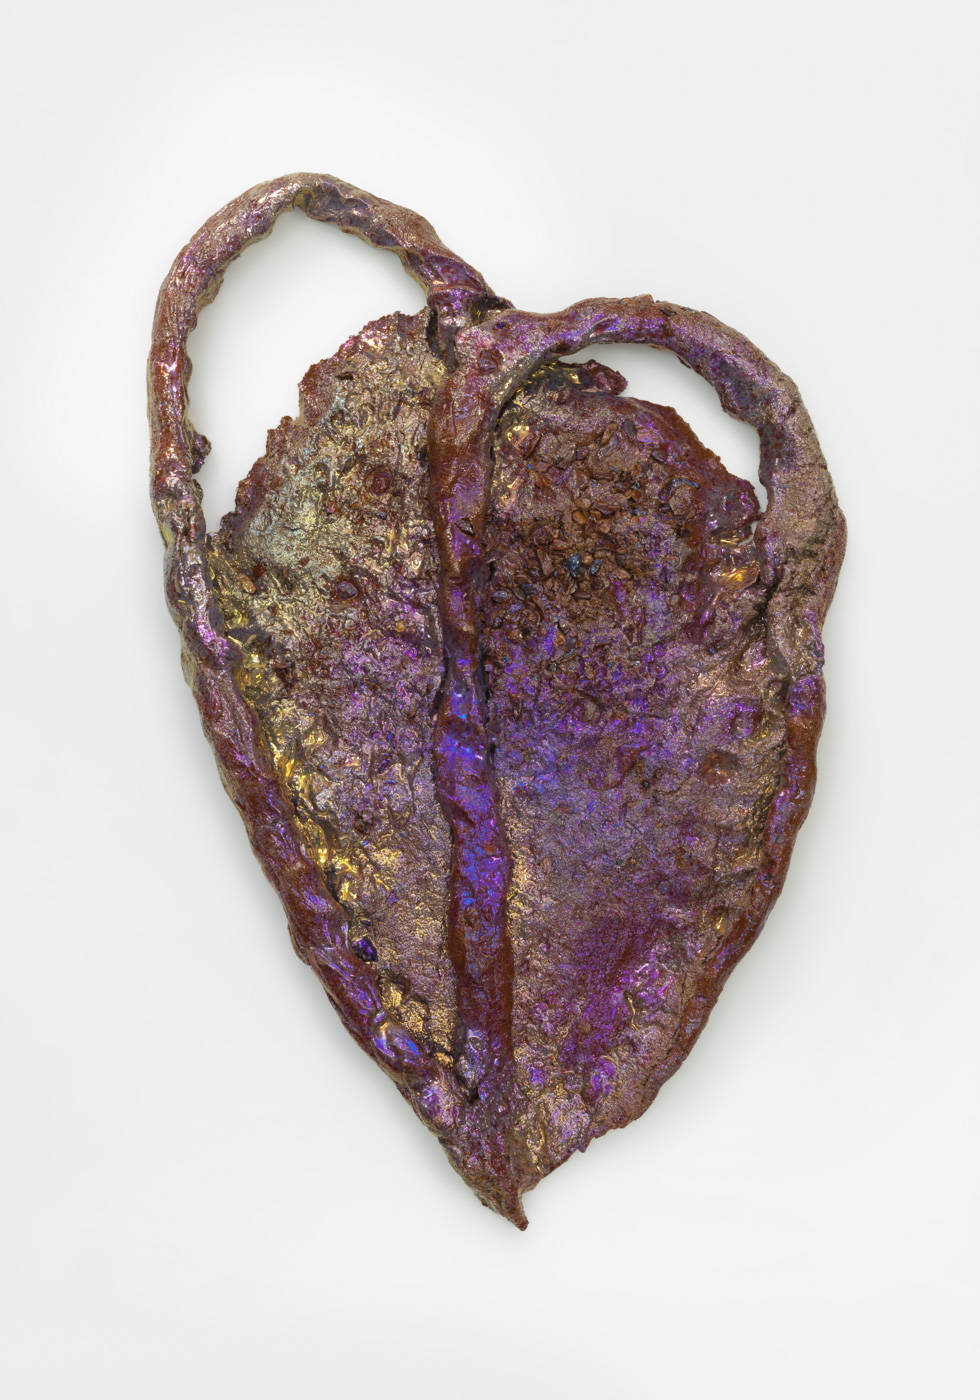 HEART (6832), 2018